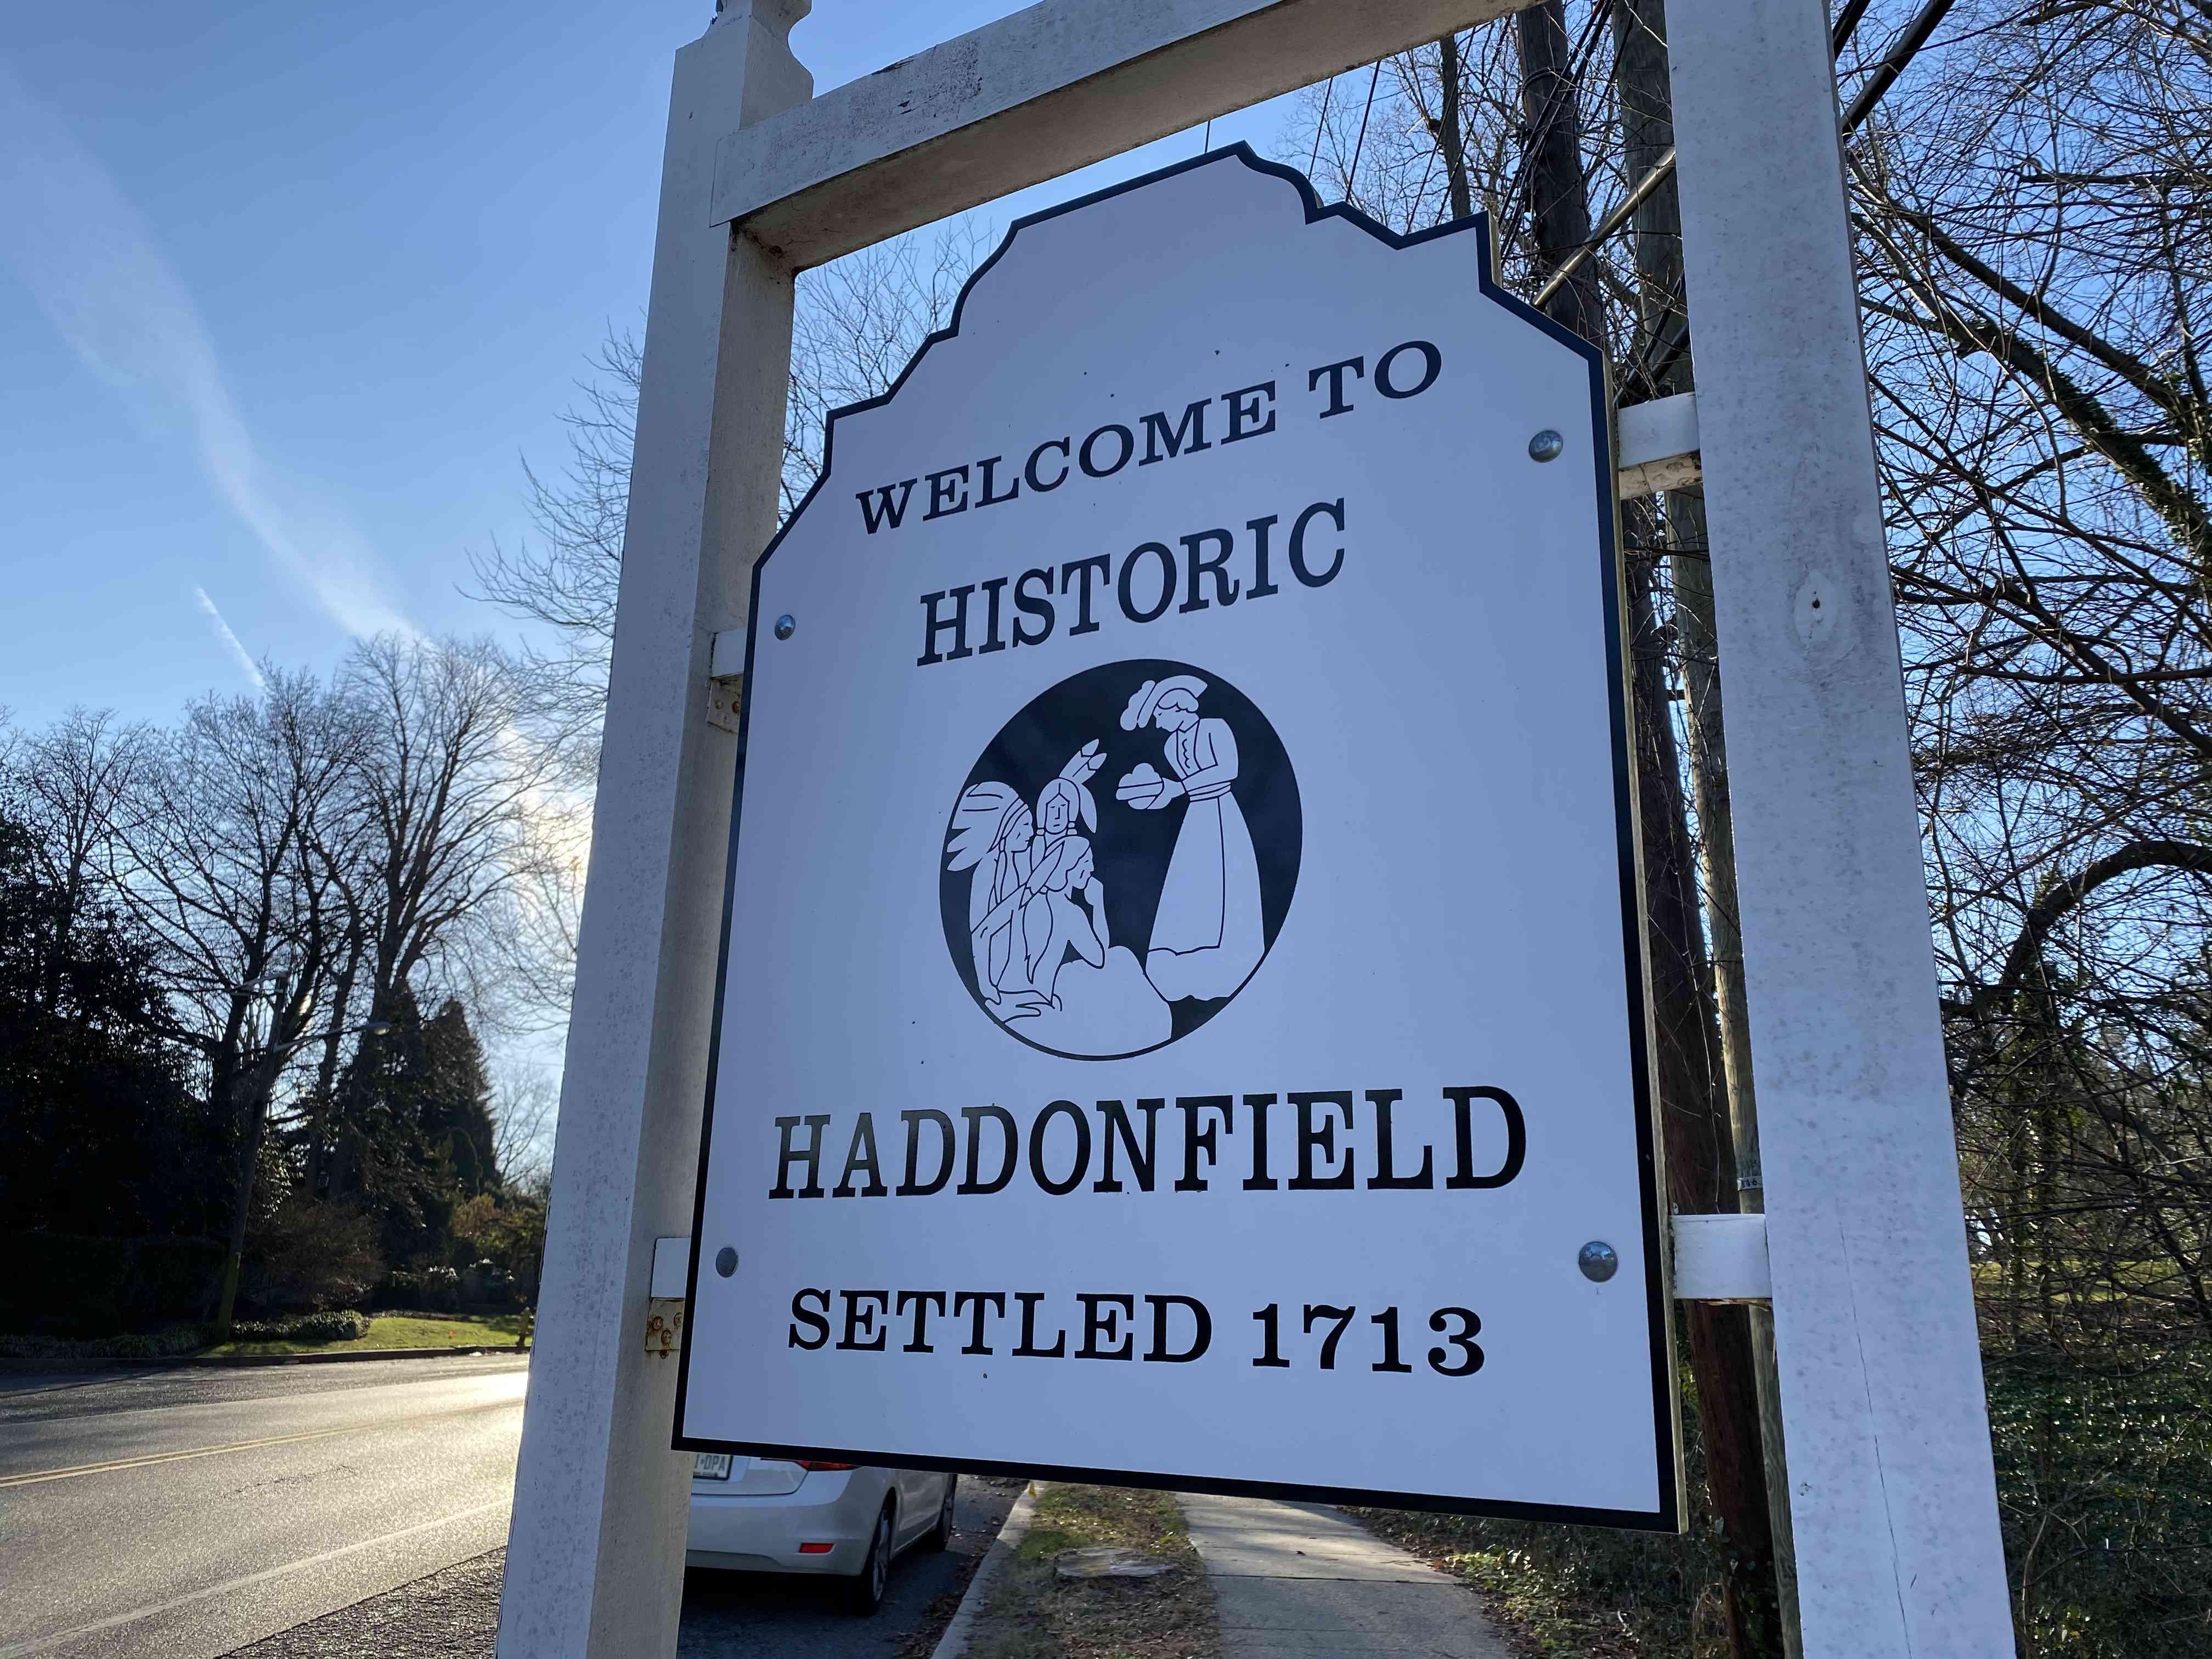 Haddonfield sign